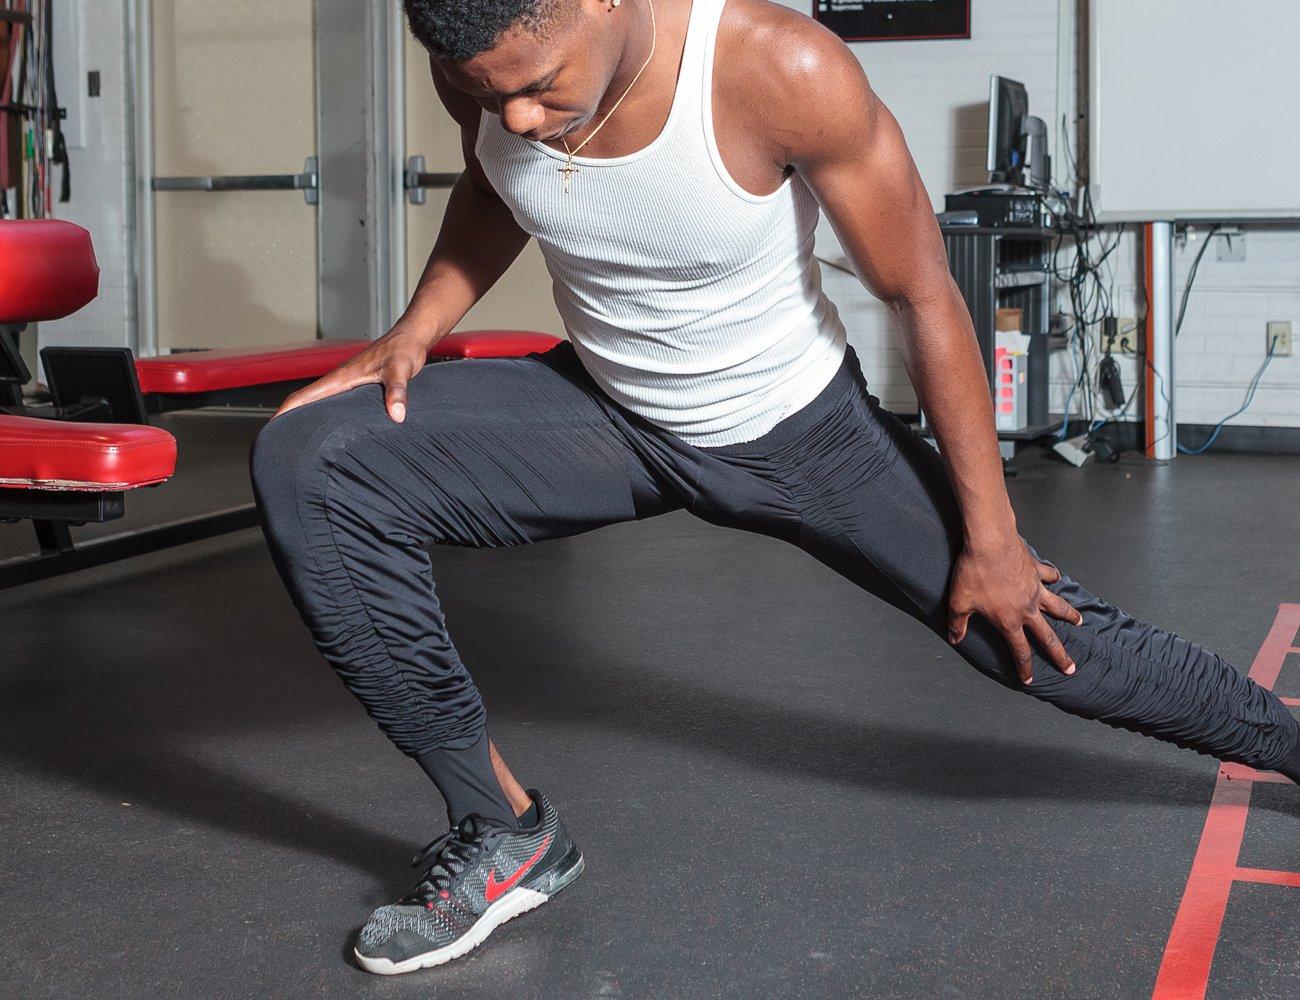 AGOGIE 2.0 – Pro Athlete Certified Training Pants